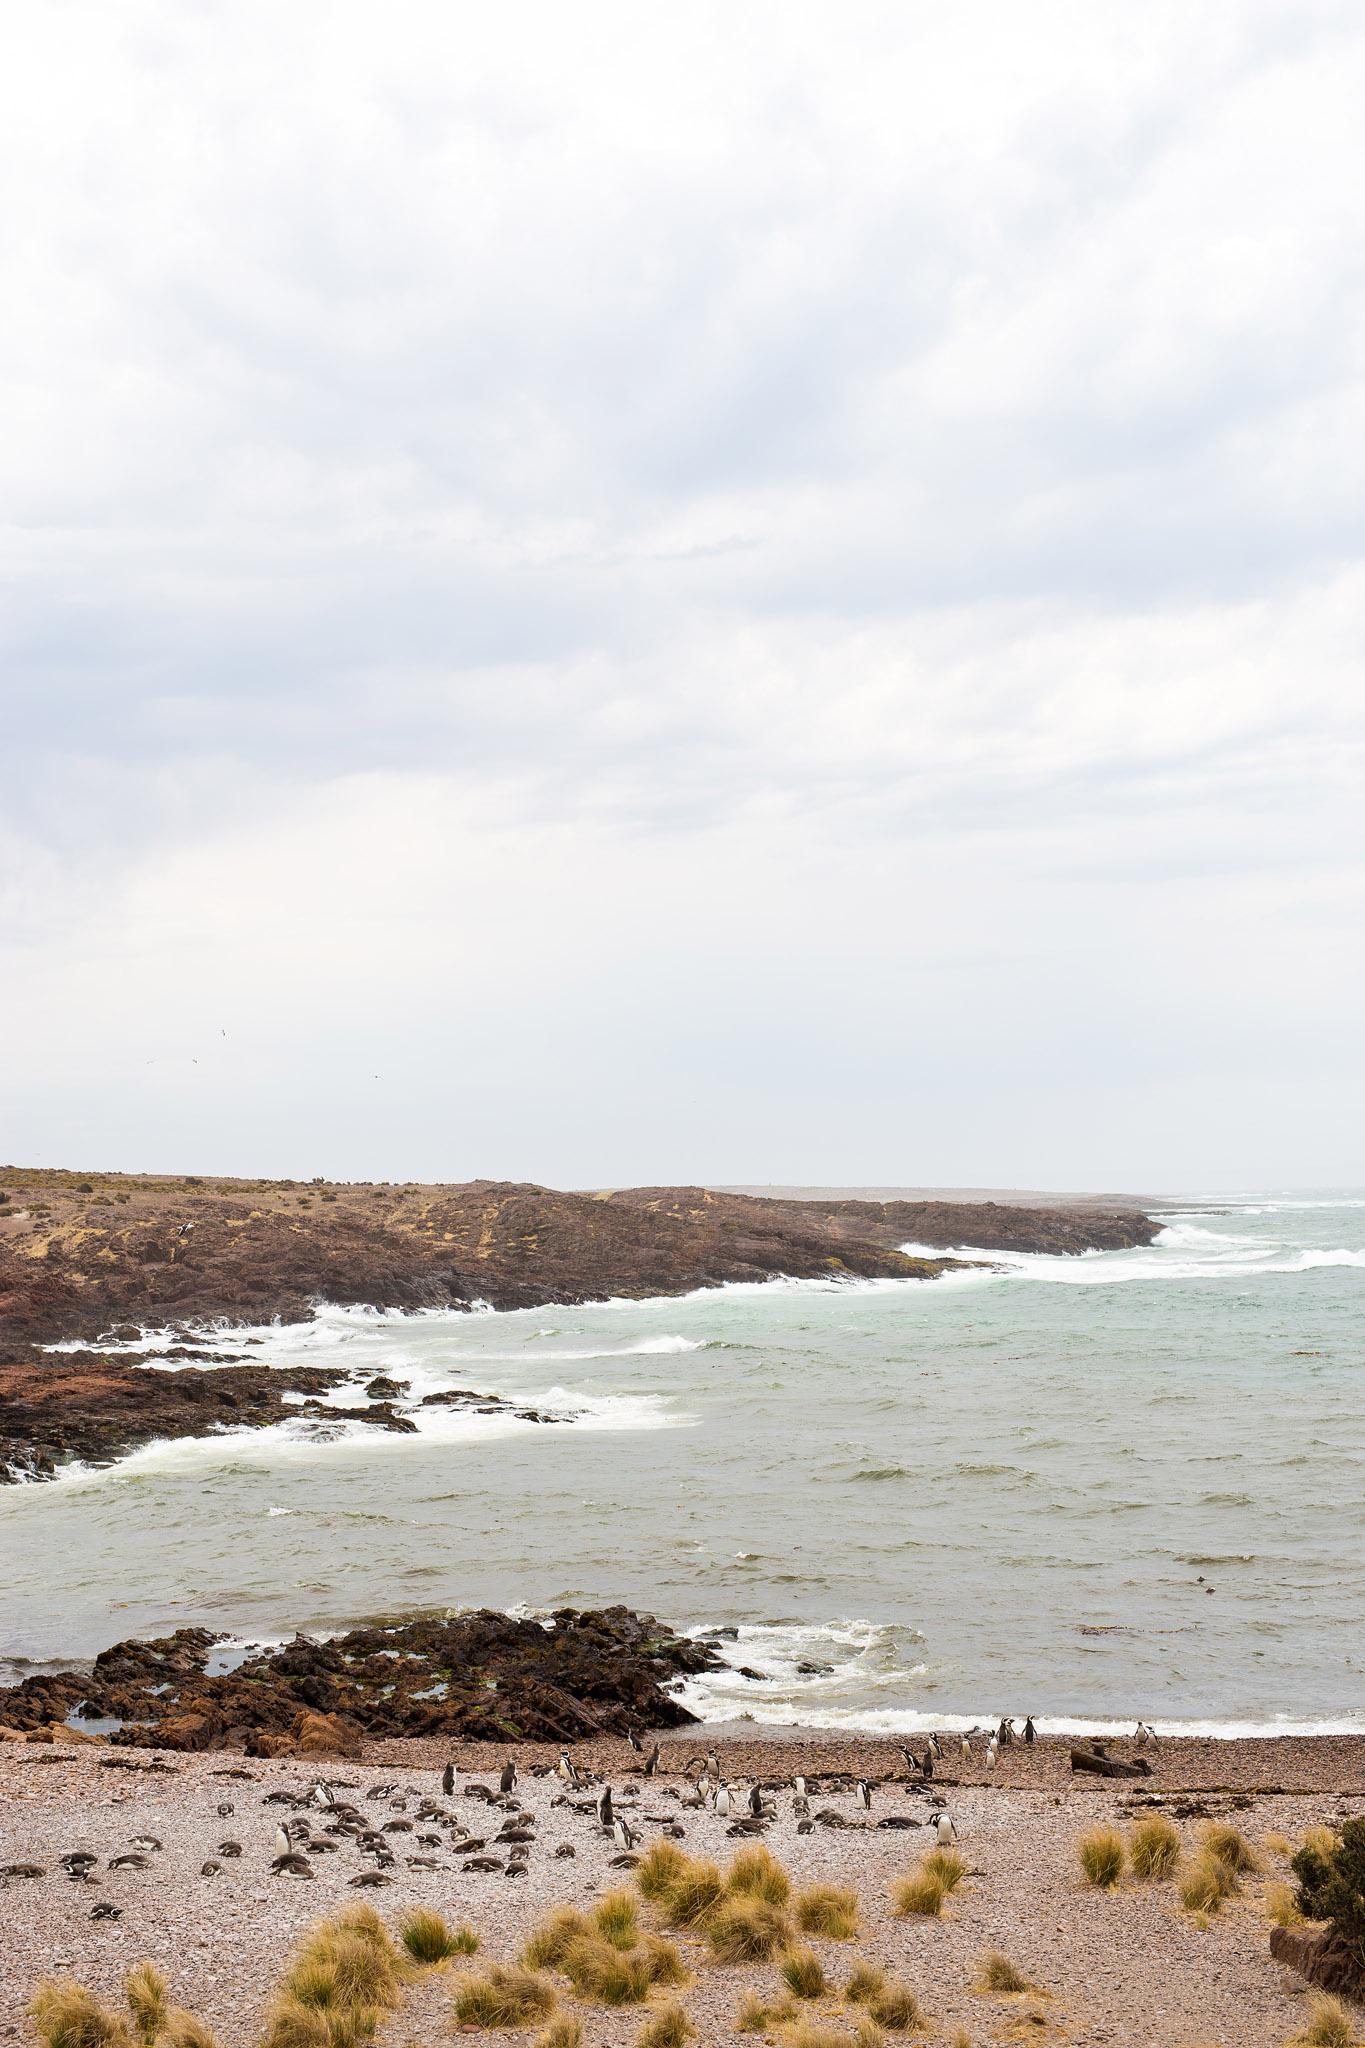 wedding-travellers-argentina-camarones-pinguins